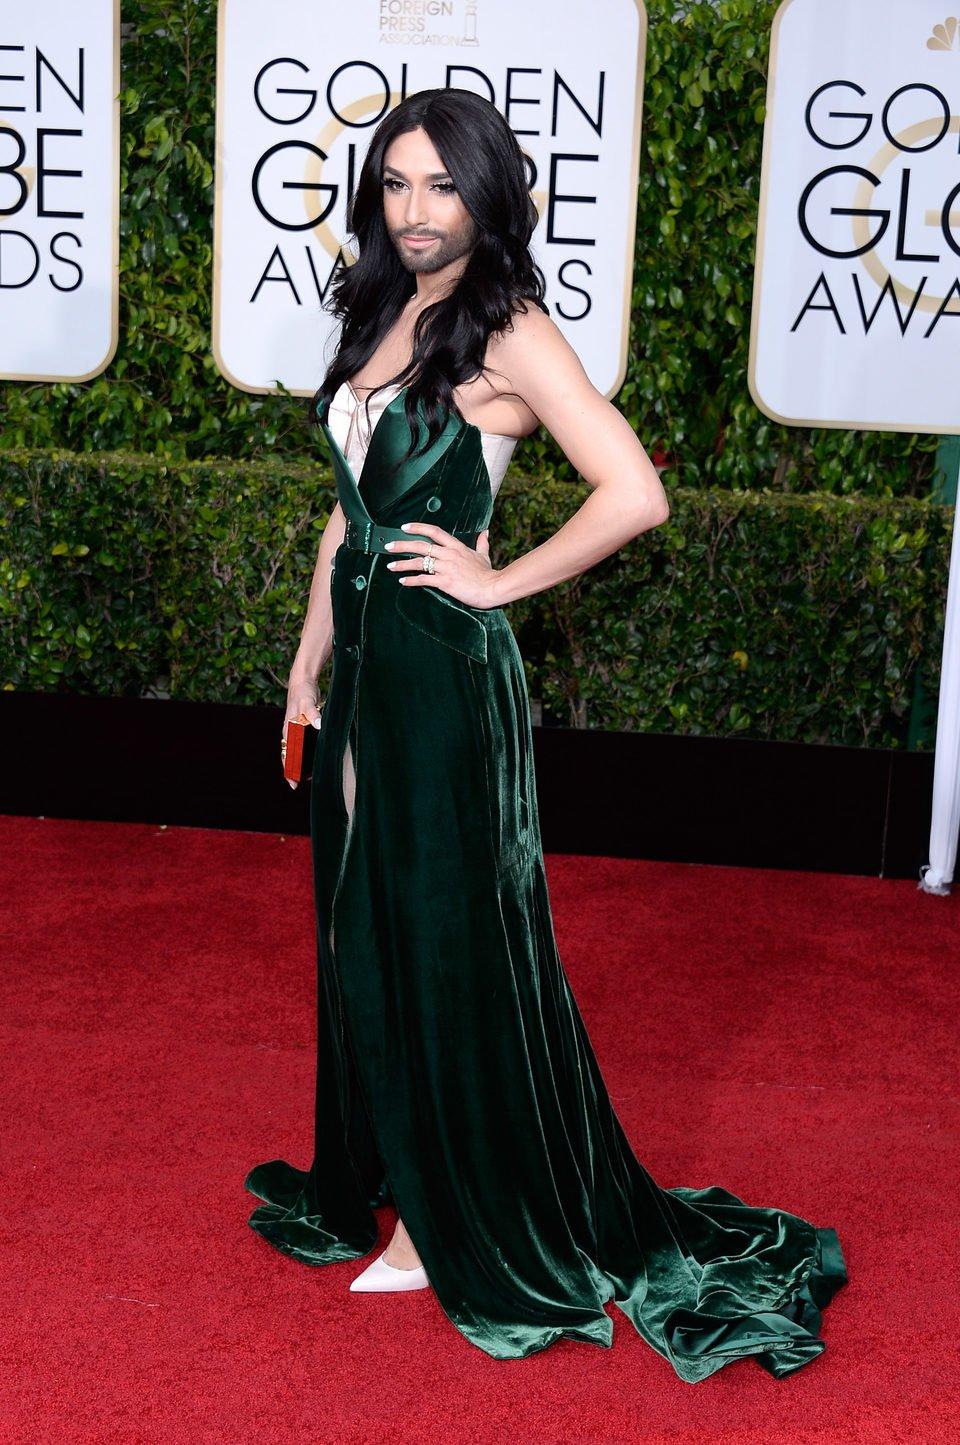 Conchita Wurst at the Golden Globes 2015 red carpet